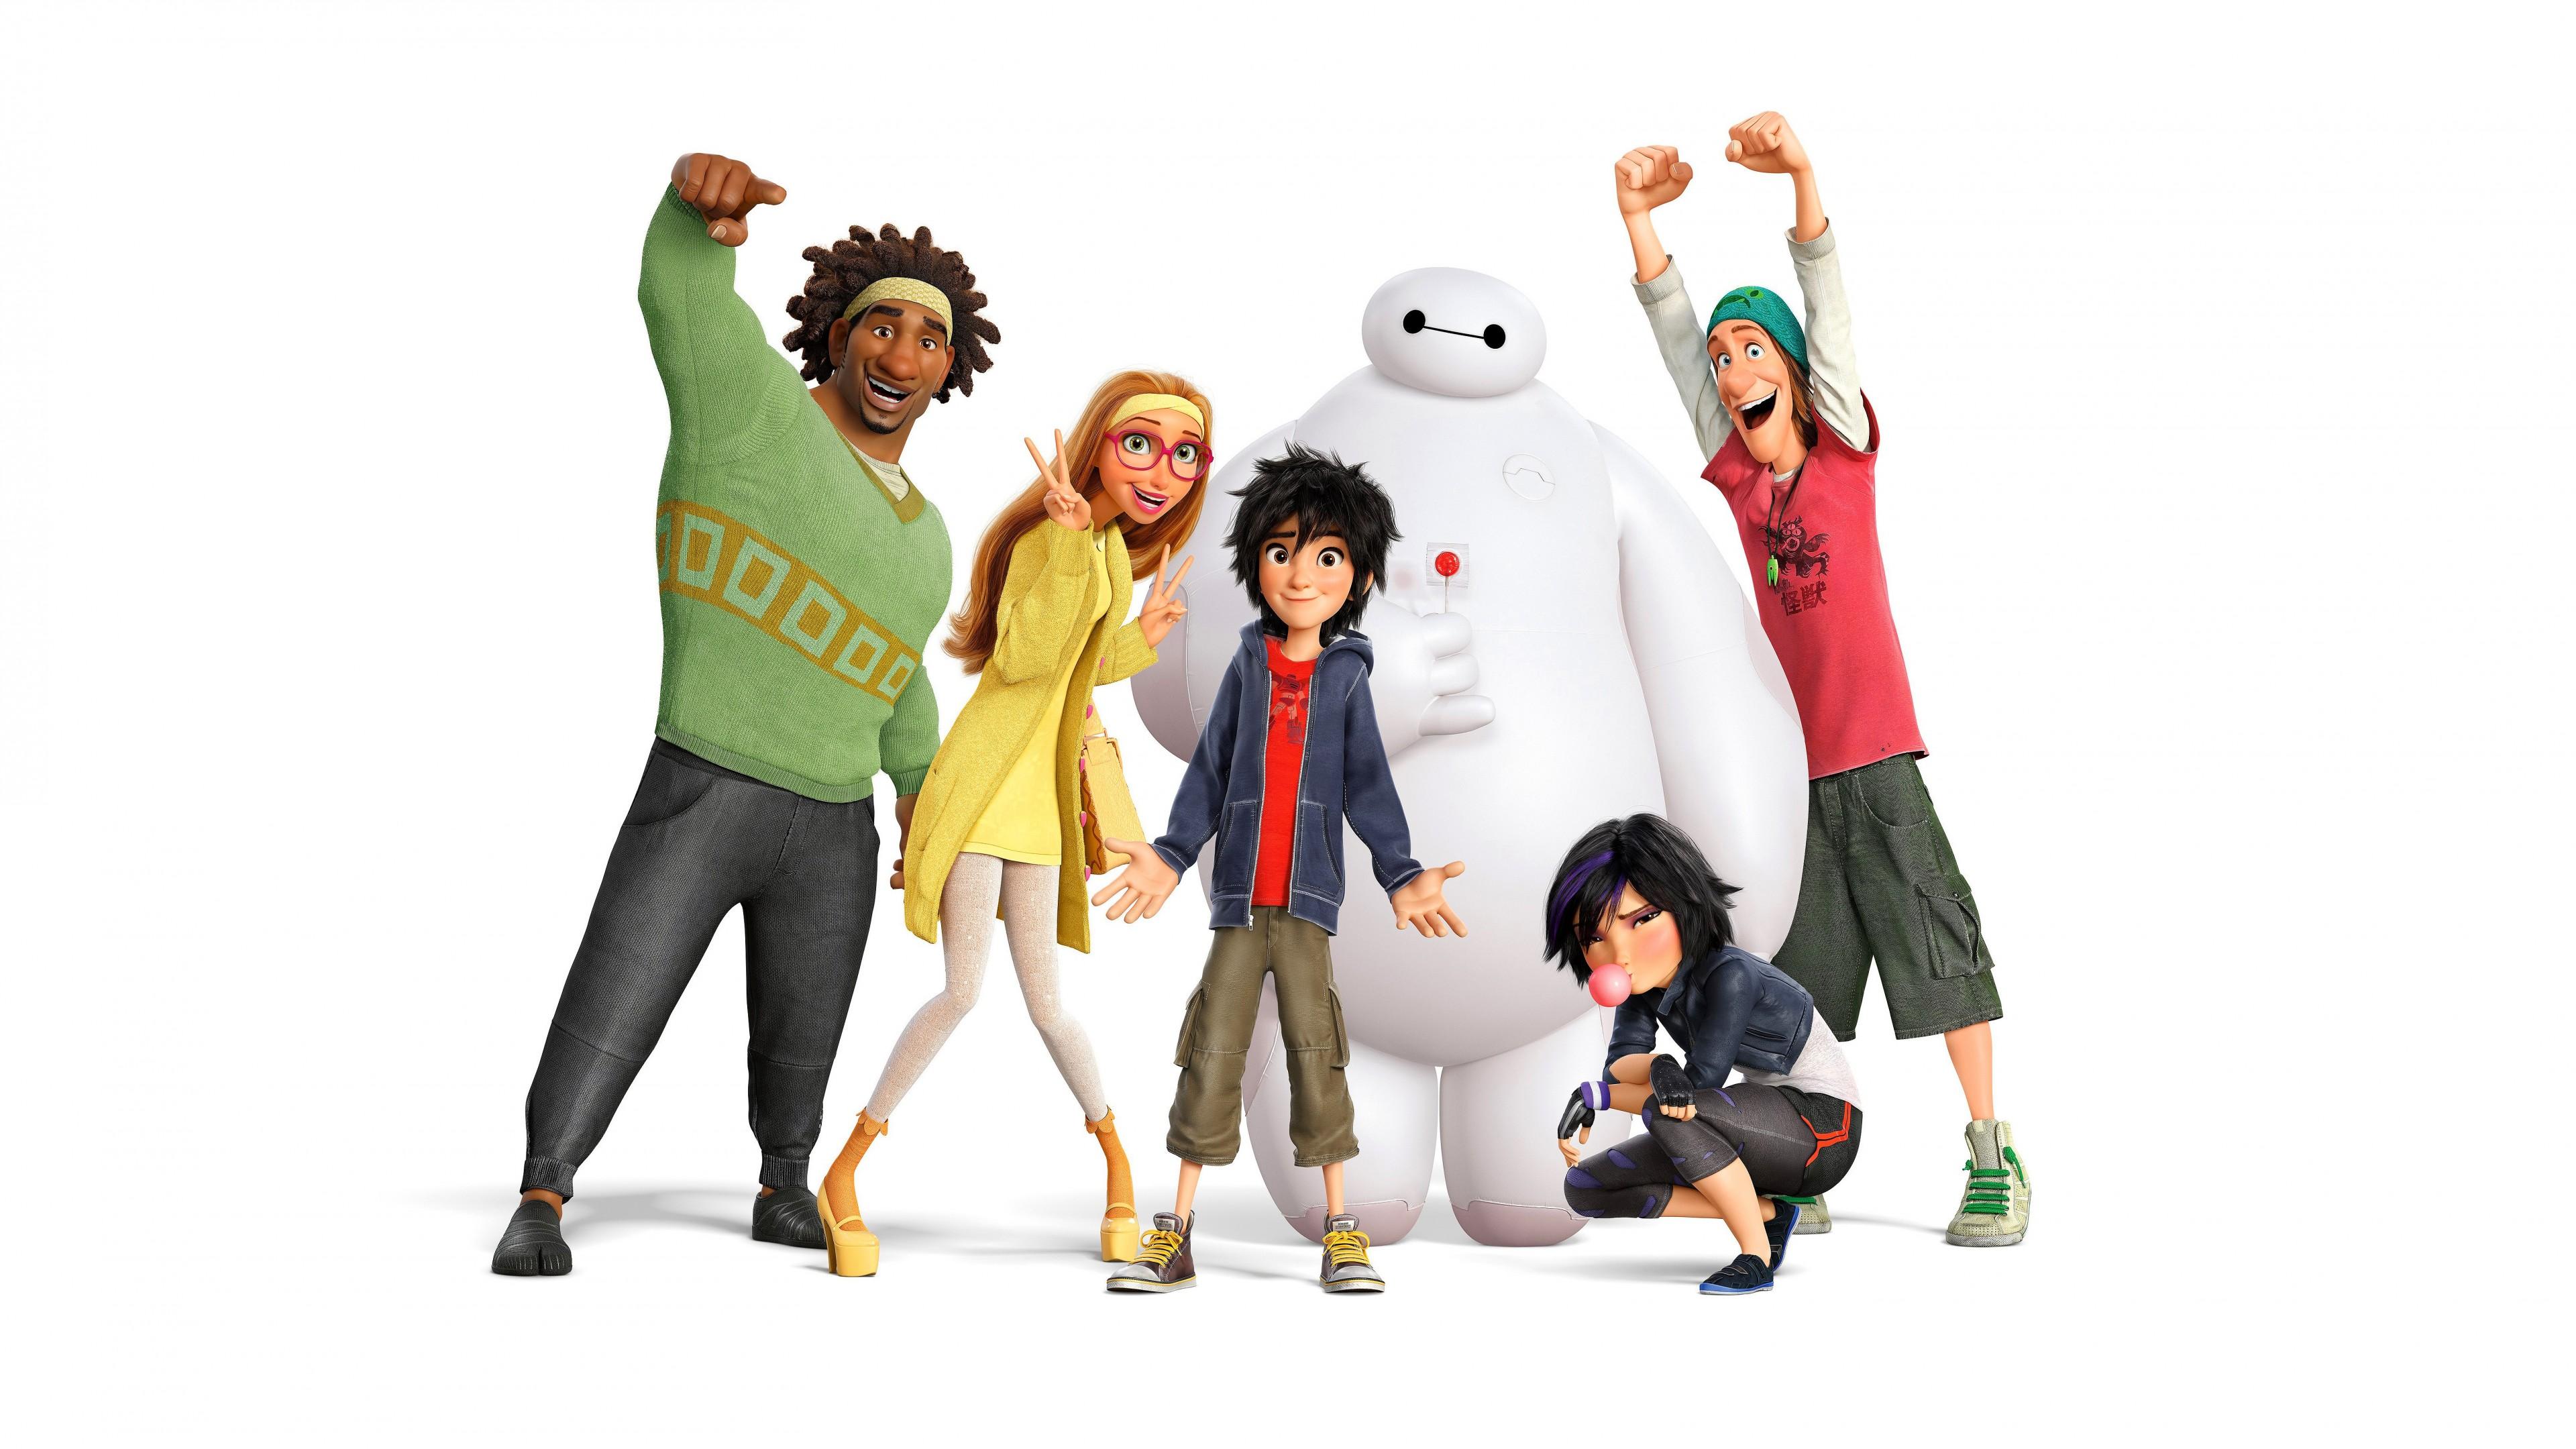 Wallpaper Big Hero 6 Names Baymax Hiro Wasabi Honey Lemon Fred Gogo Tomago Best Animation Movies Of 2015 Movies 3772